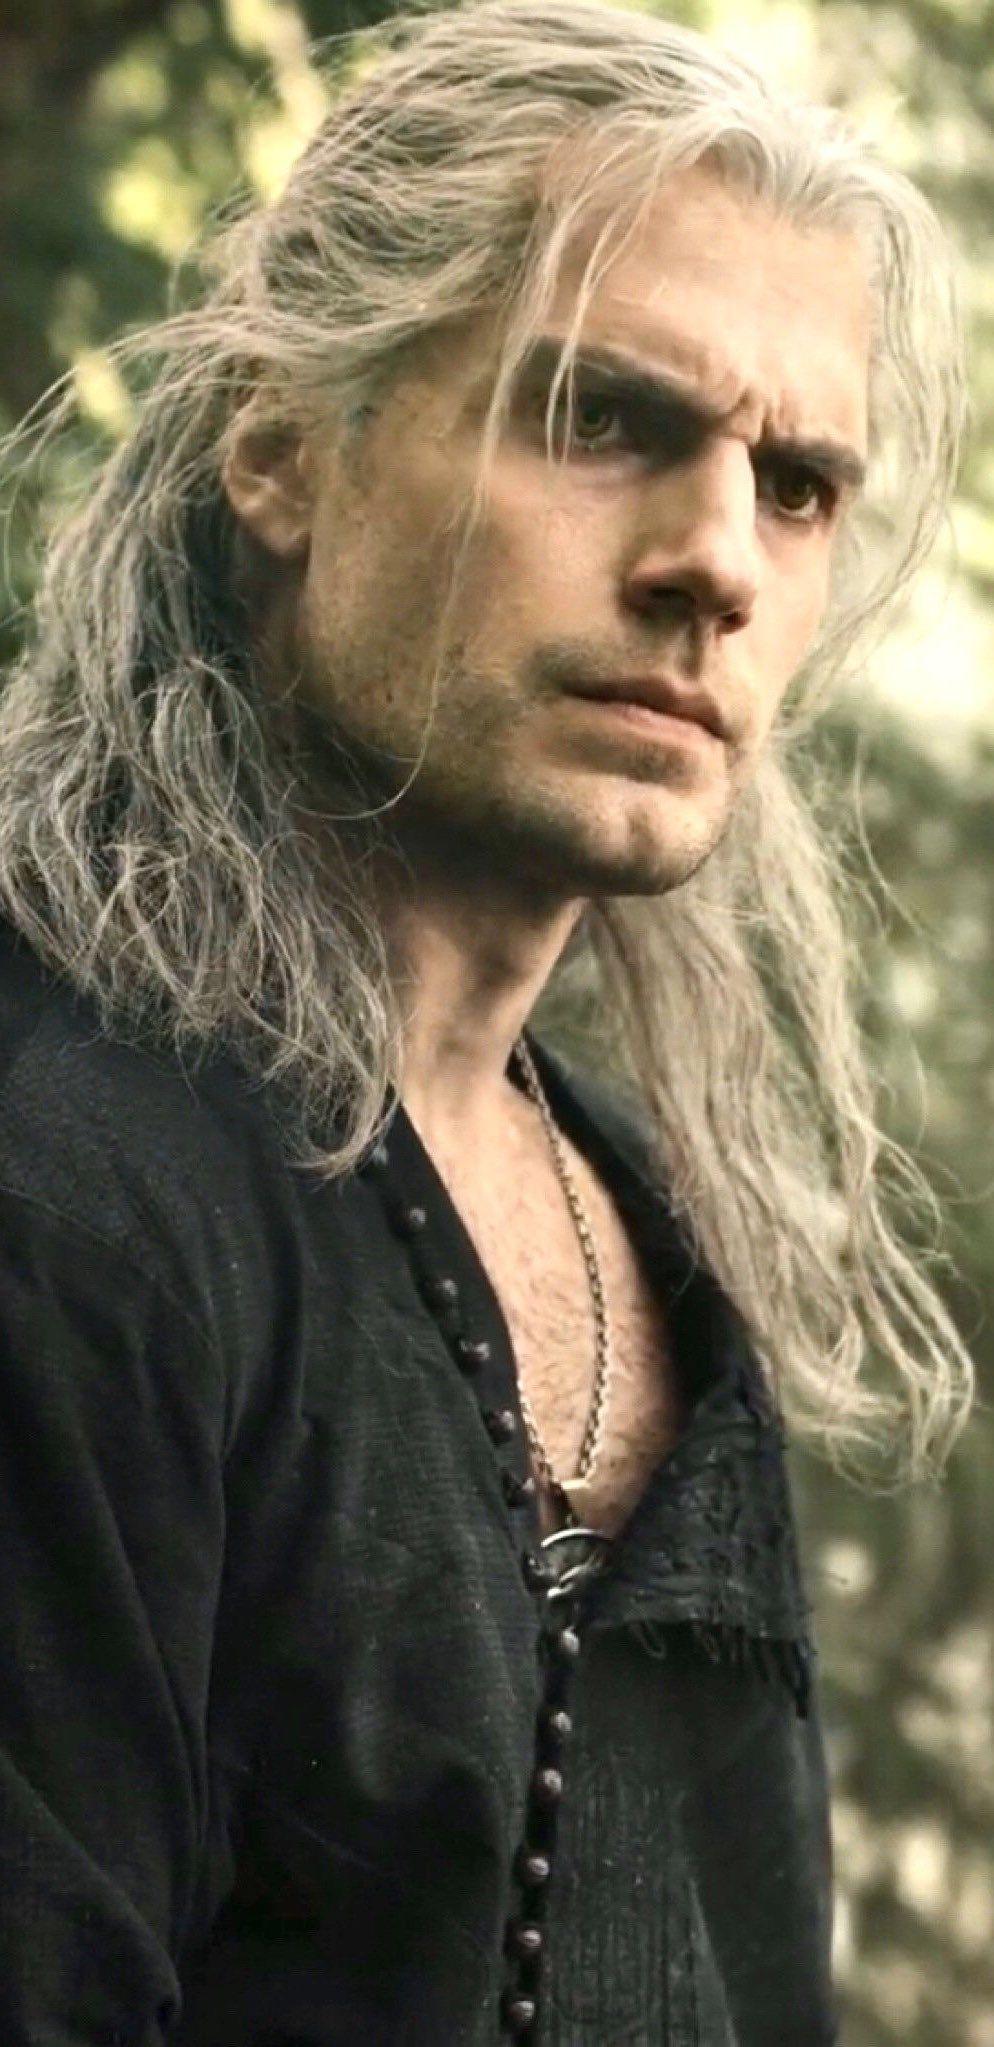 Pin By Tashley Tucker On Henry Cavill The Witcher The Witcher Geralt The Witcher Geralt Of Rivia